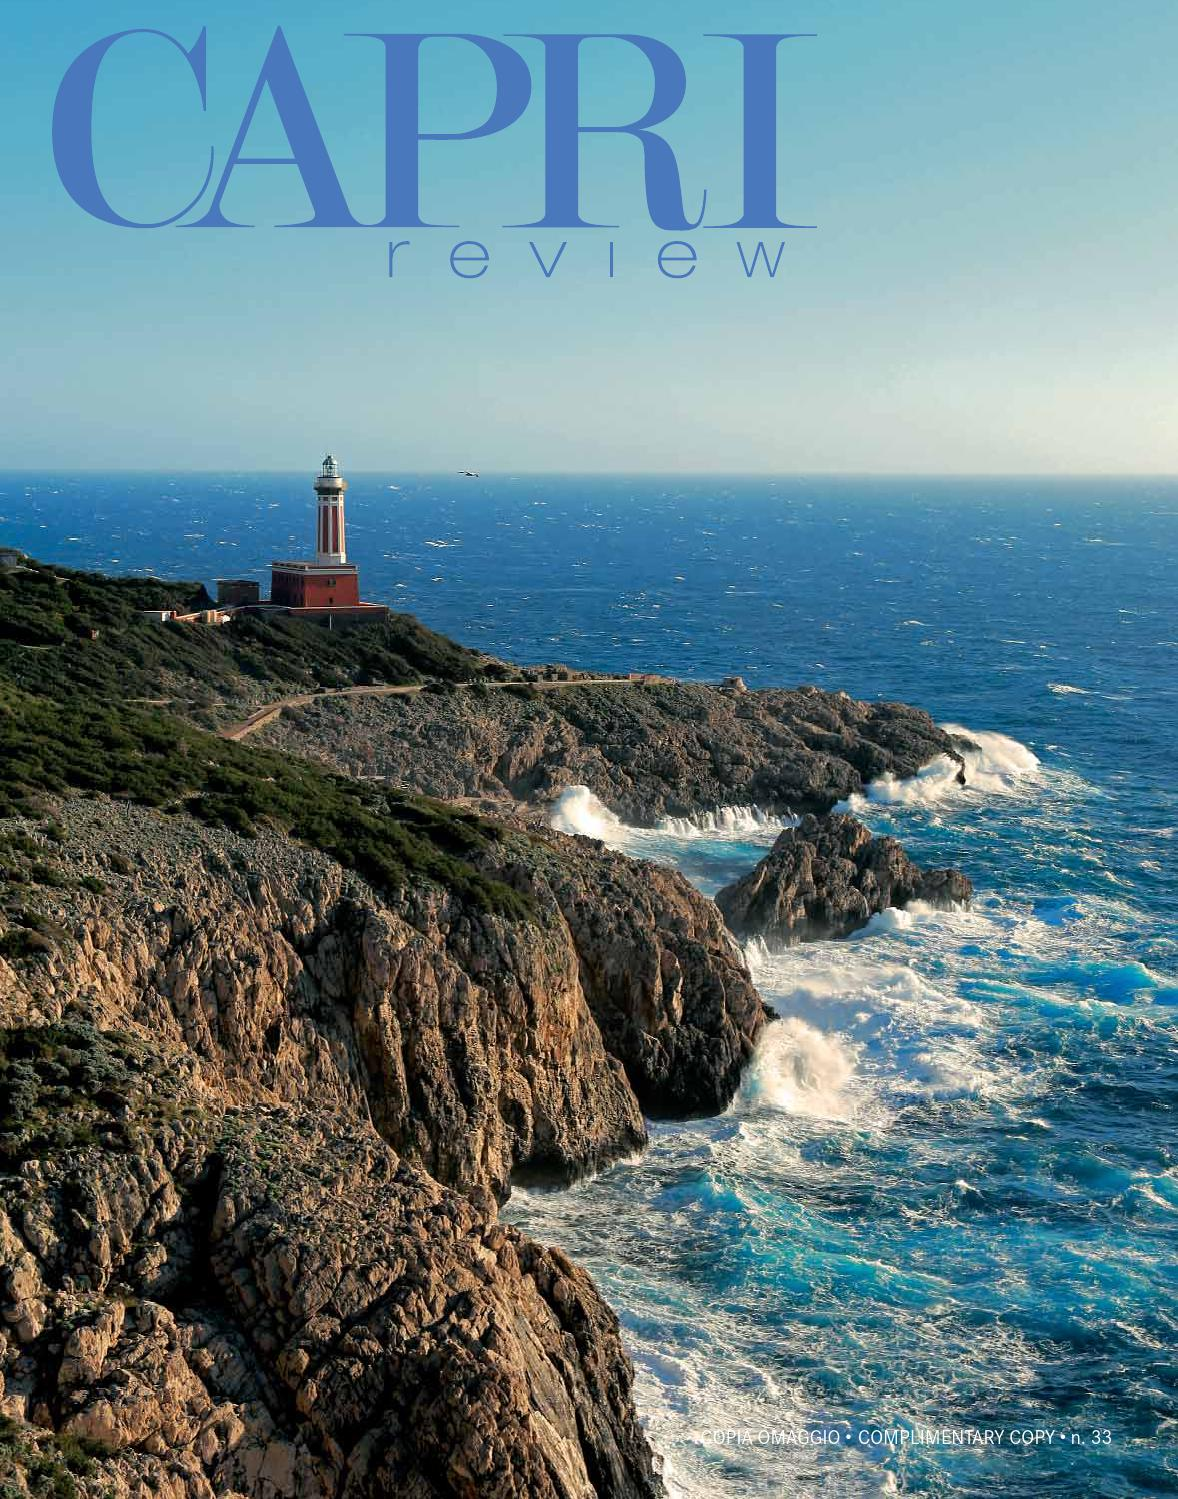 Capri Review 33 by Capri Review - Issuu